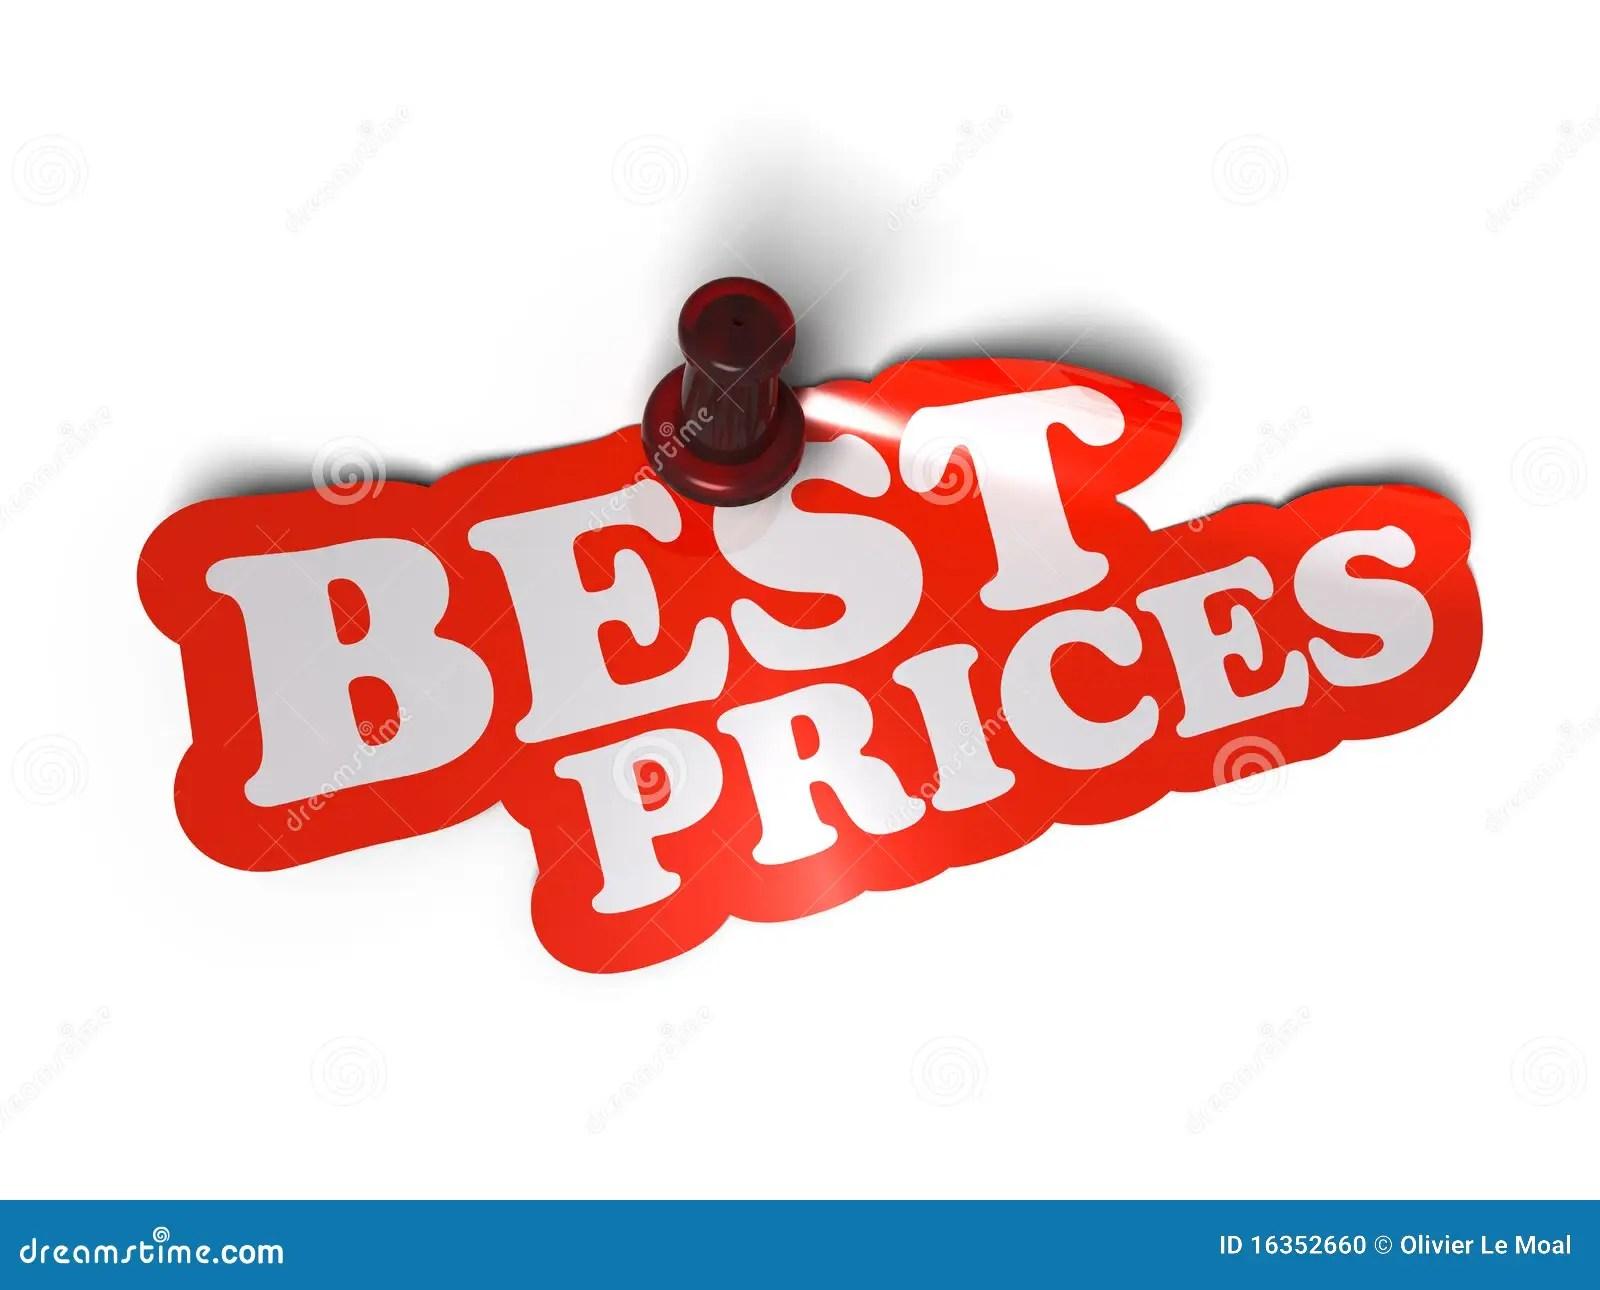 Best prices stock illustration Illustration of decorative  16352660